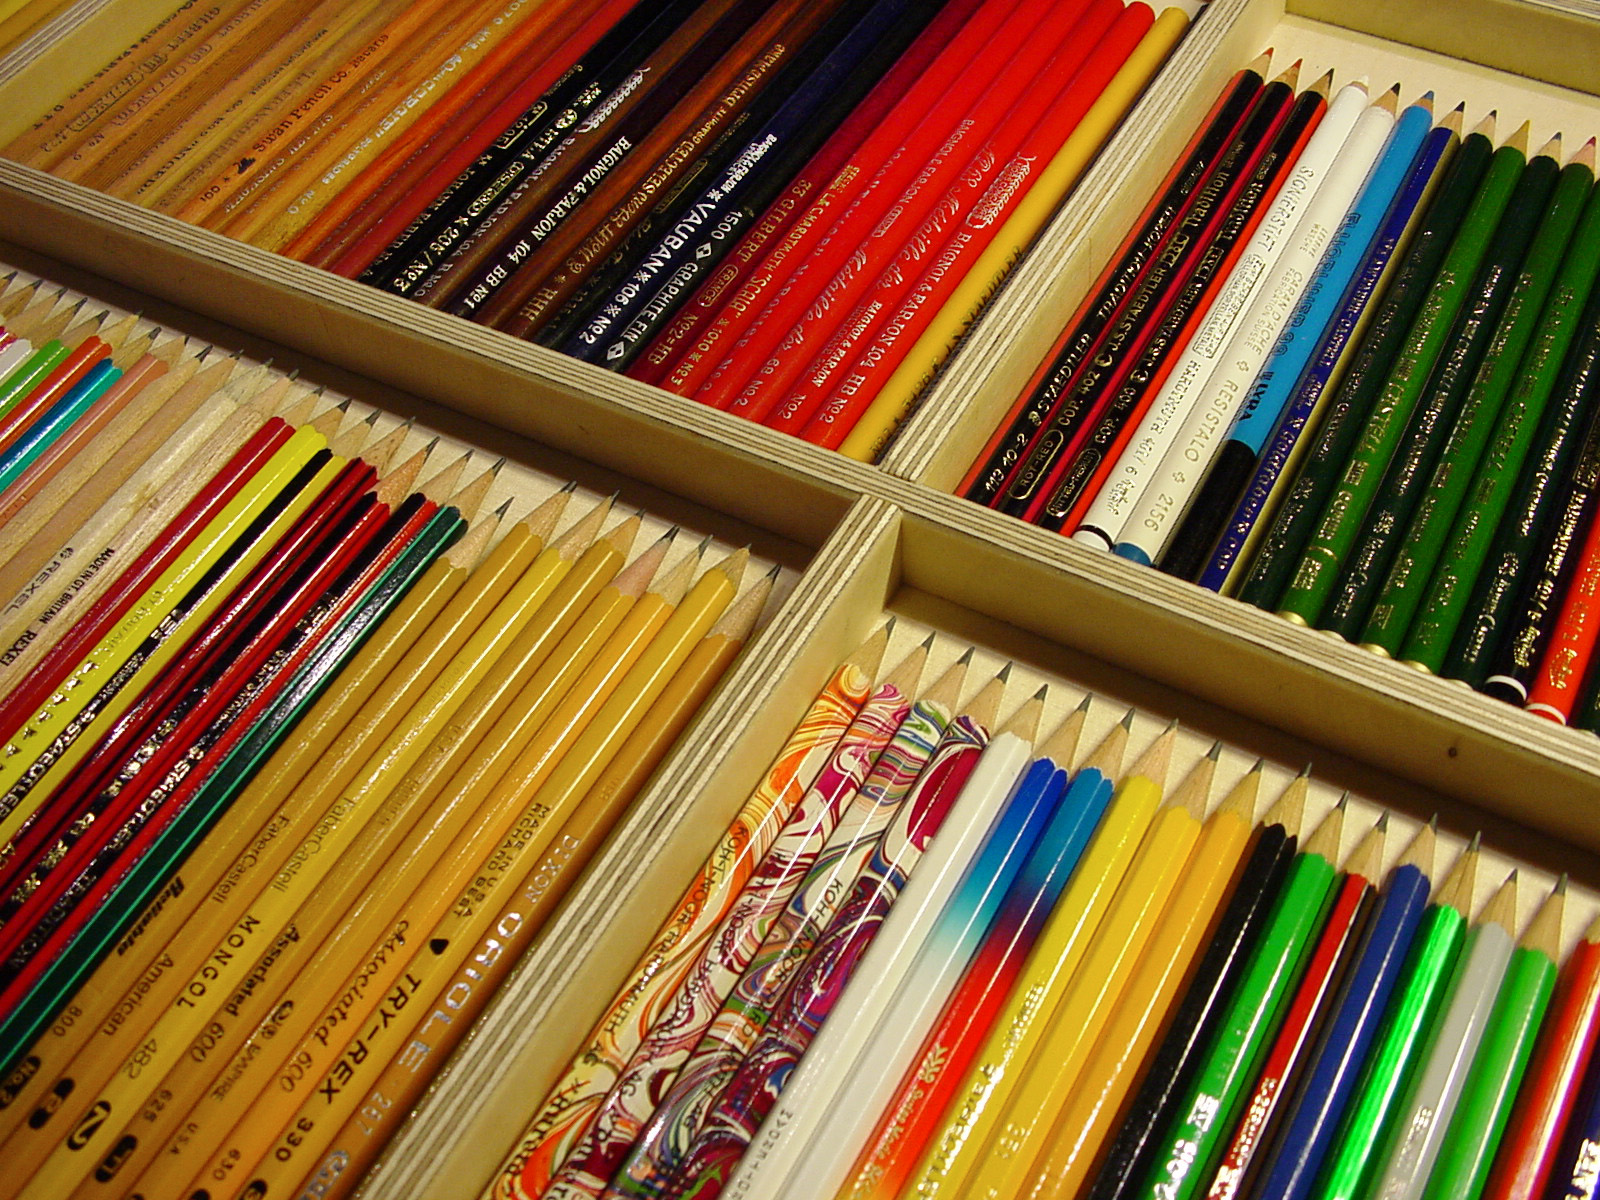 mdc-2001-crayons-05-1600